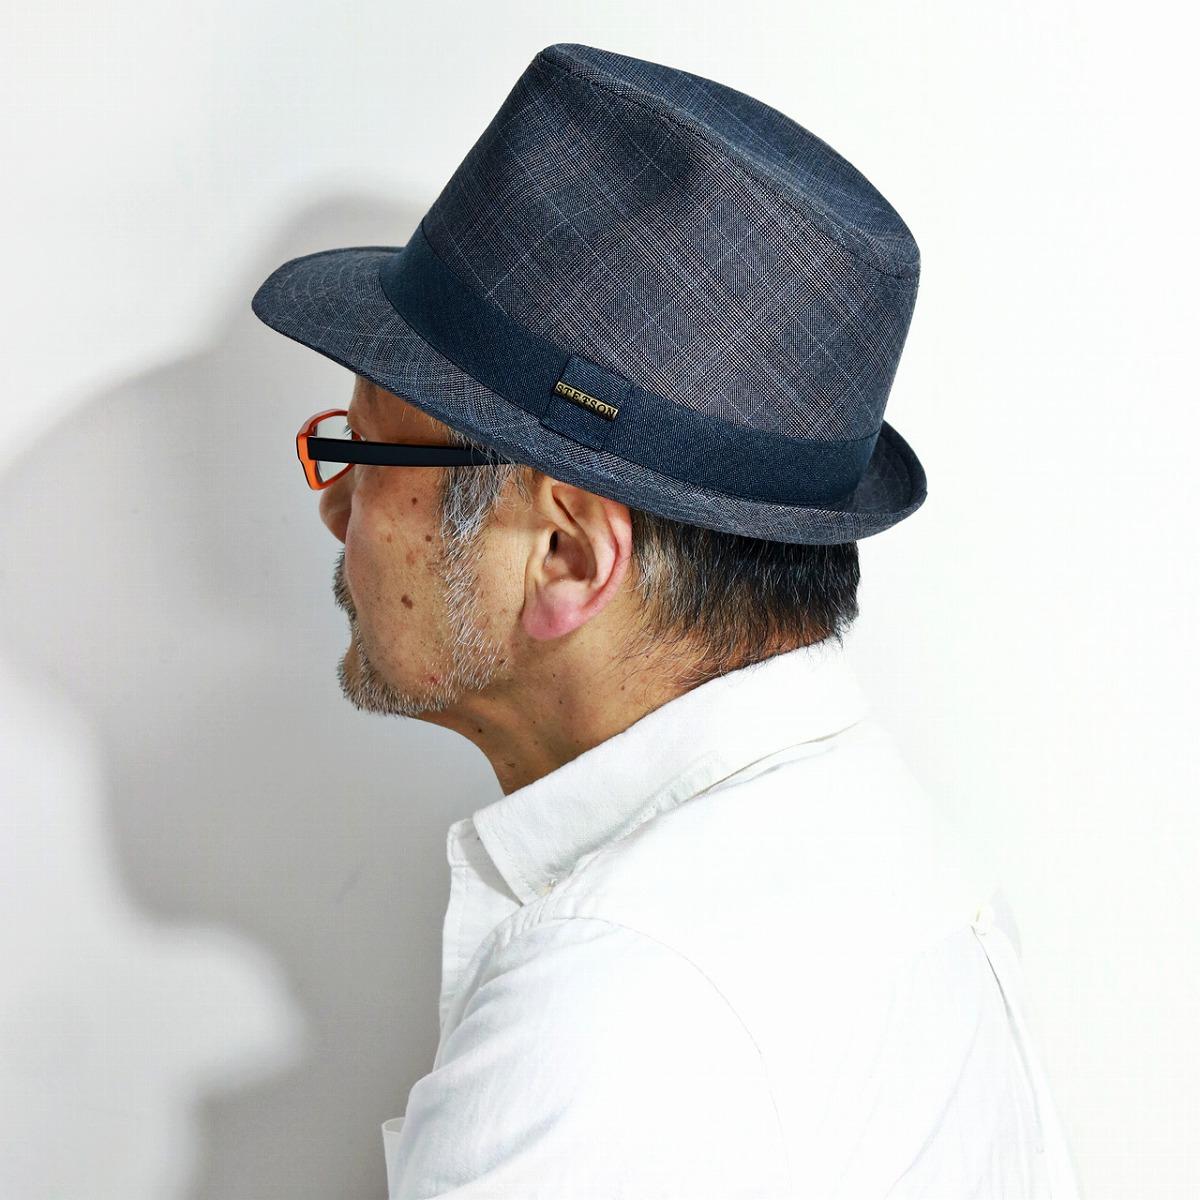 stetson ハット 春 夏 秋 チェック柄 帽子 中折れハット 紳士 HAT 中折れ帽 チェック 日よけ カジュアル レディース ステットソン ぼうし 大きいサイズ M L XL / グレー[ fedora ]男性 プレゼント 帽子通販